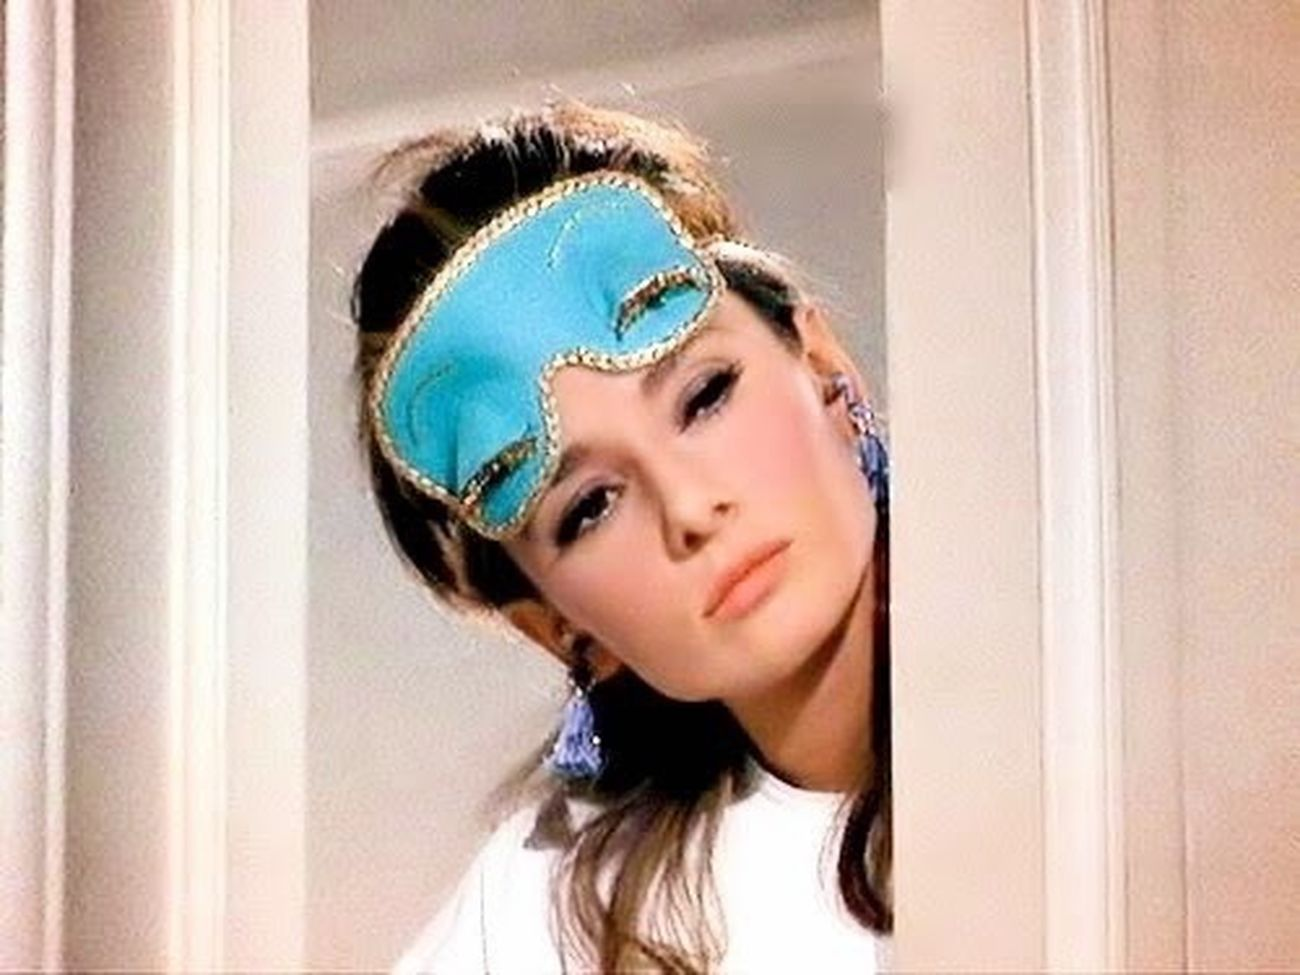 GM Goodmorning Audrey Hepburn Fun Morning